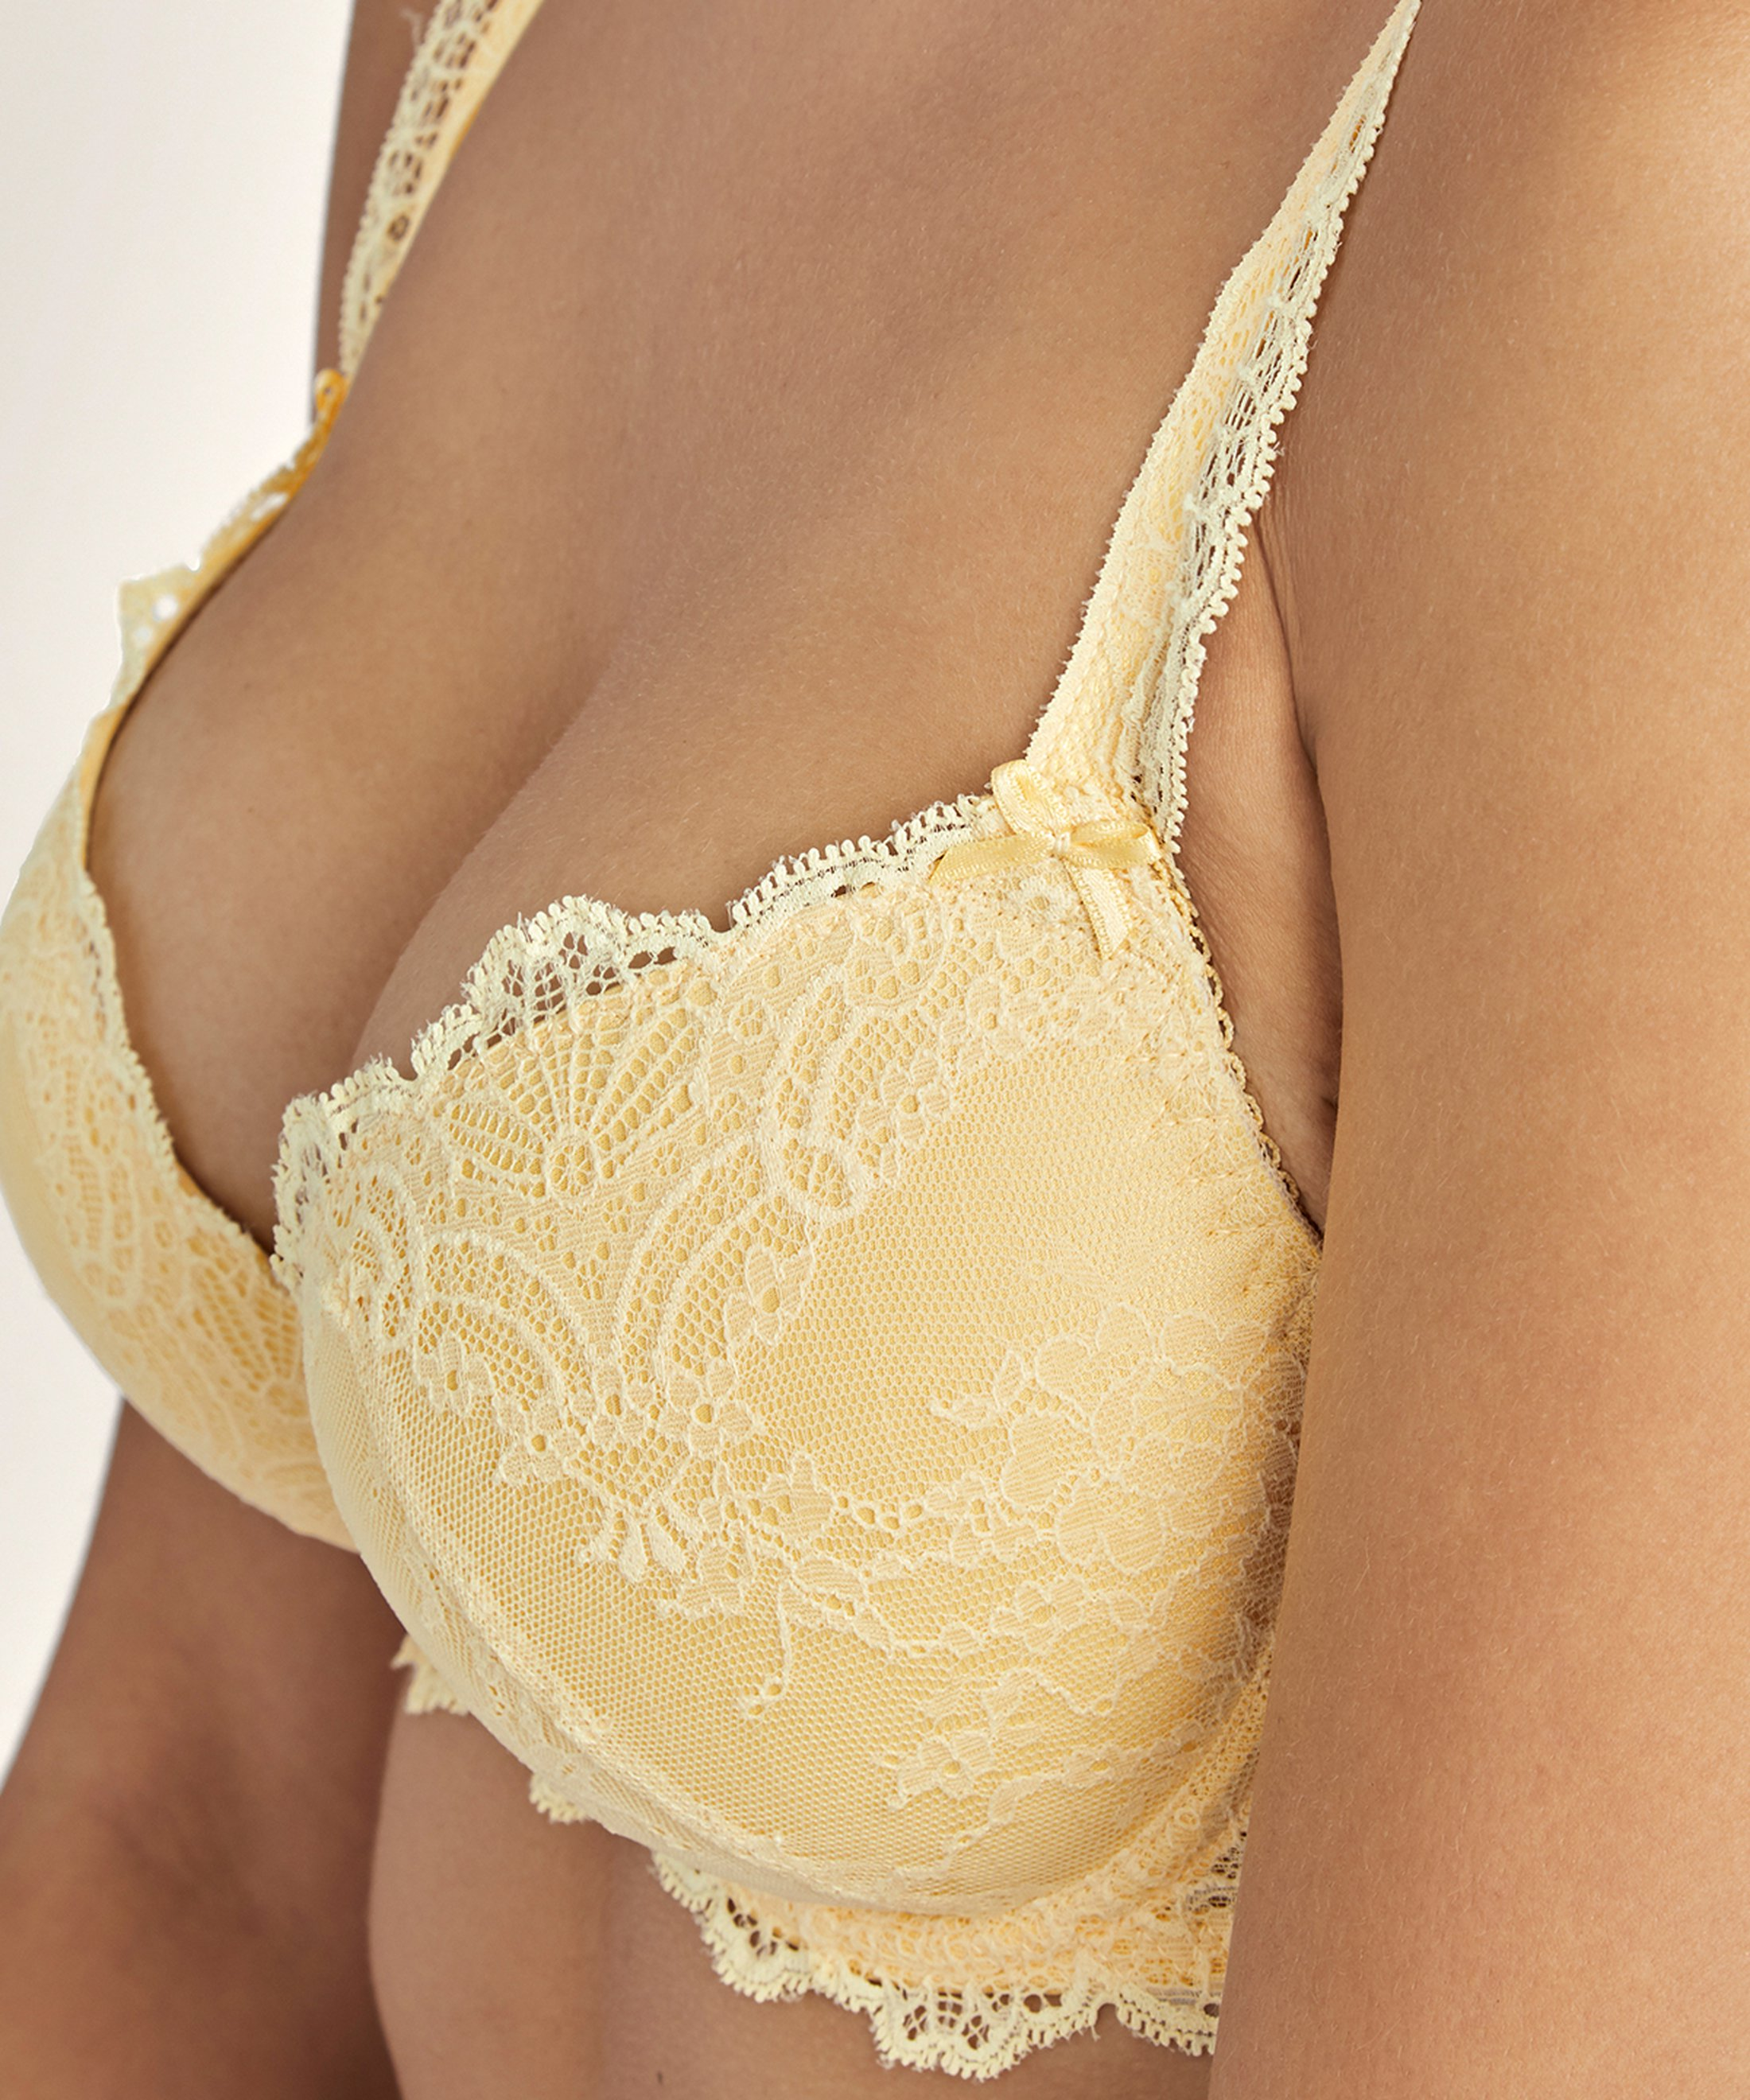 DANSE DES SENS Moulded push-up bra Mango Yellow | Aubade